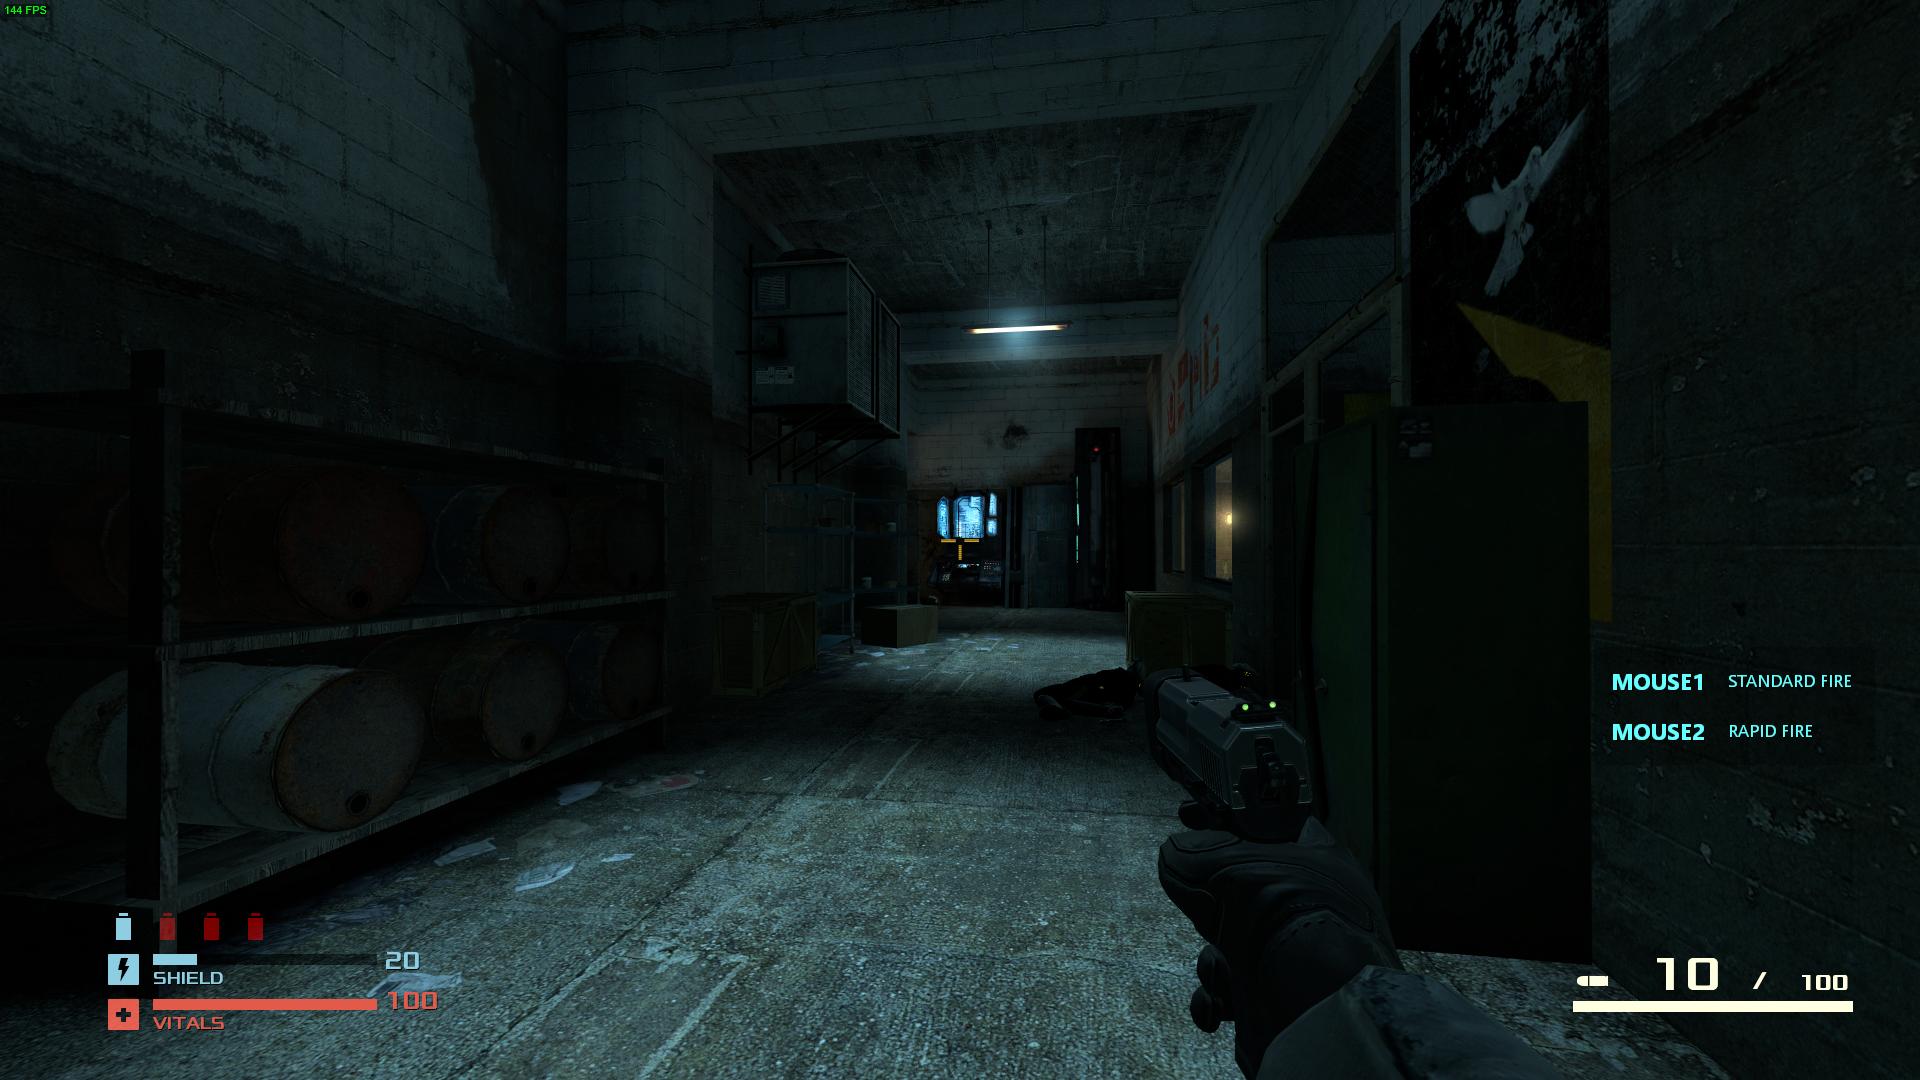 securityroom3